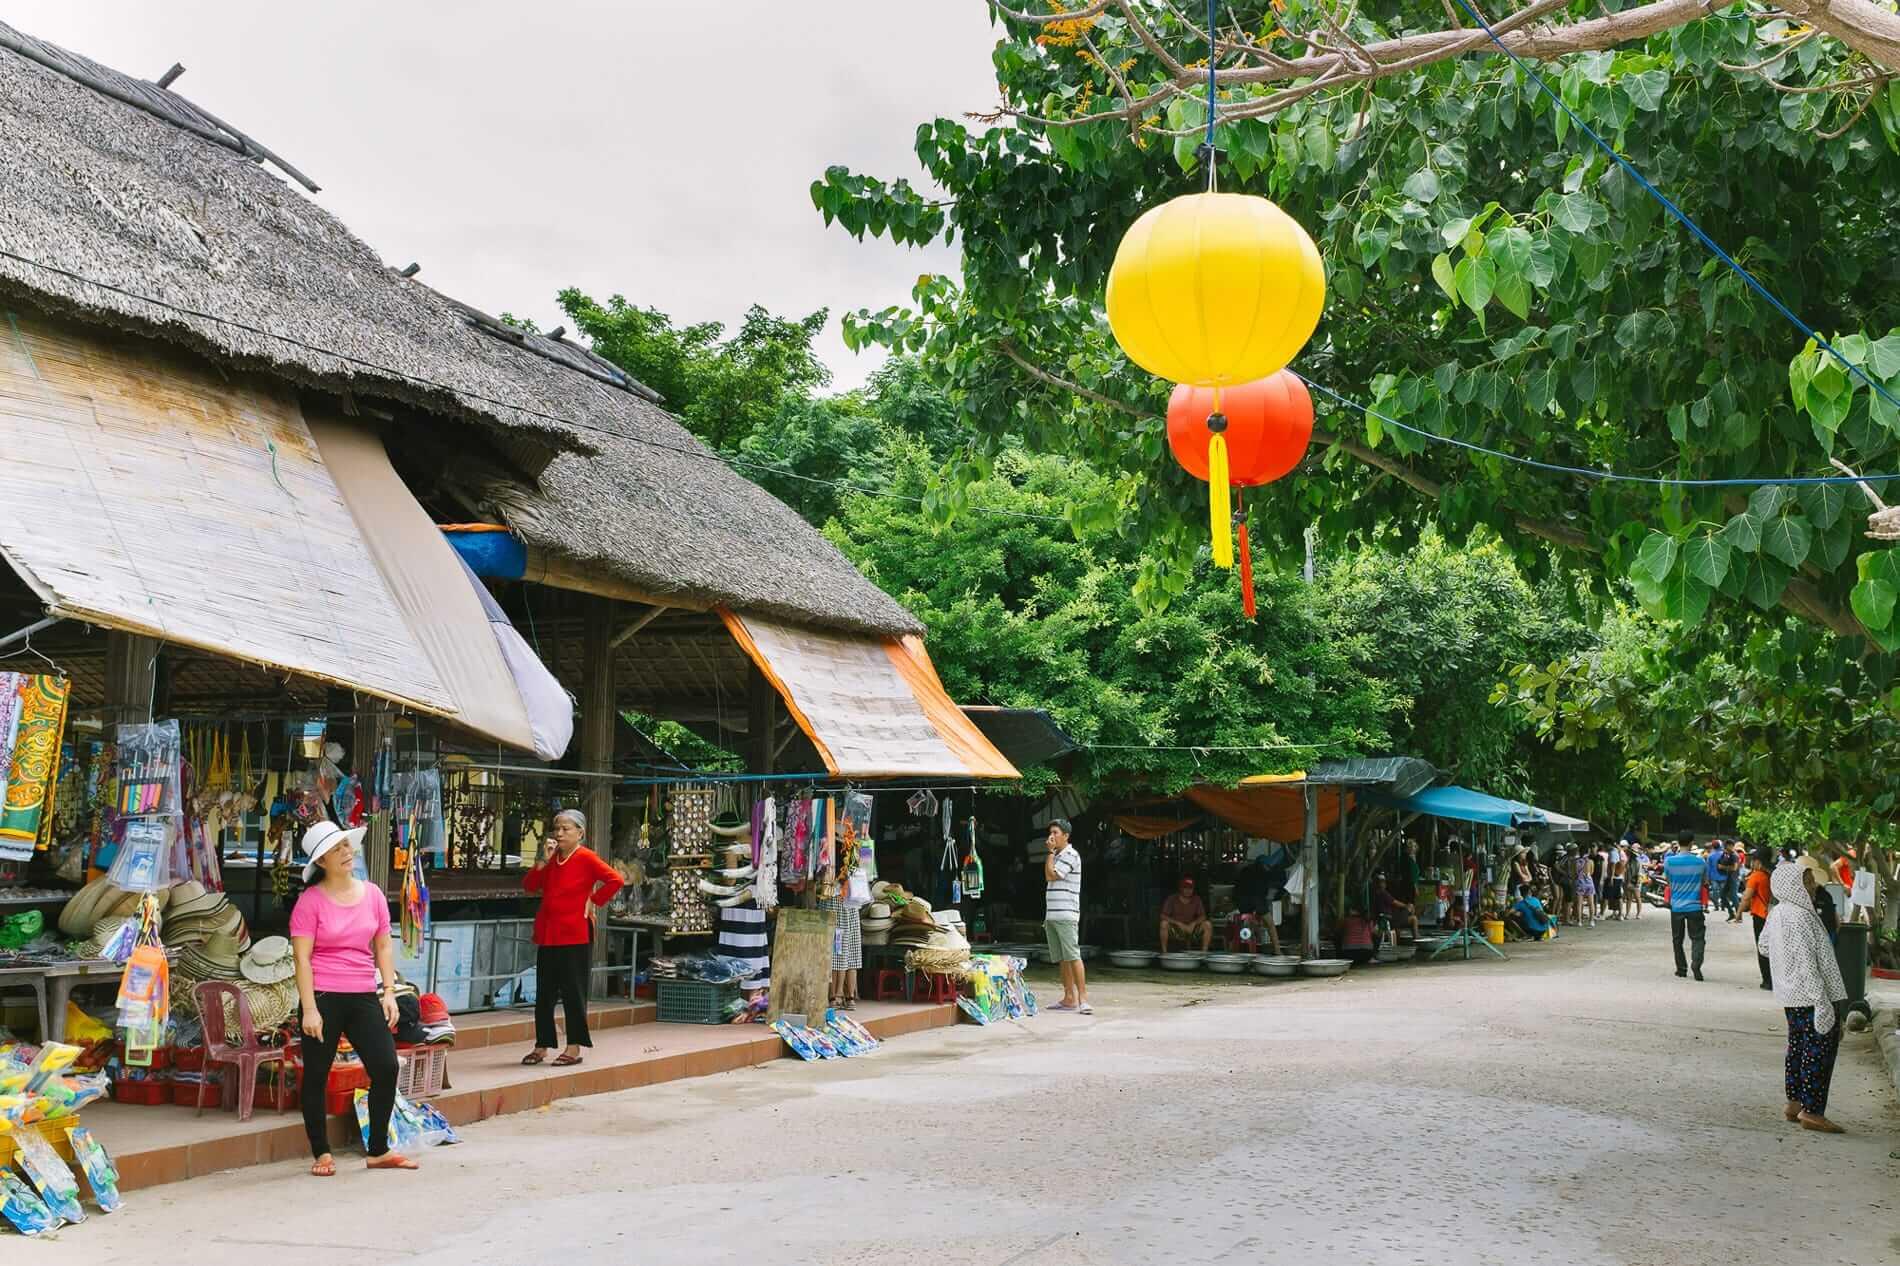 Shops of Bai Lang - Cham Islands Accommodations